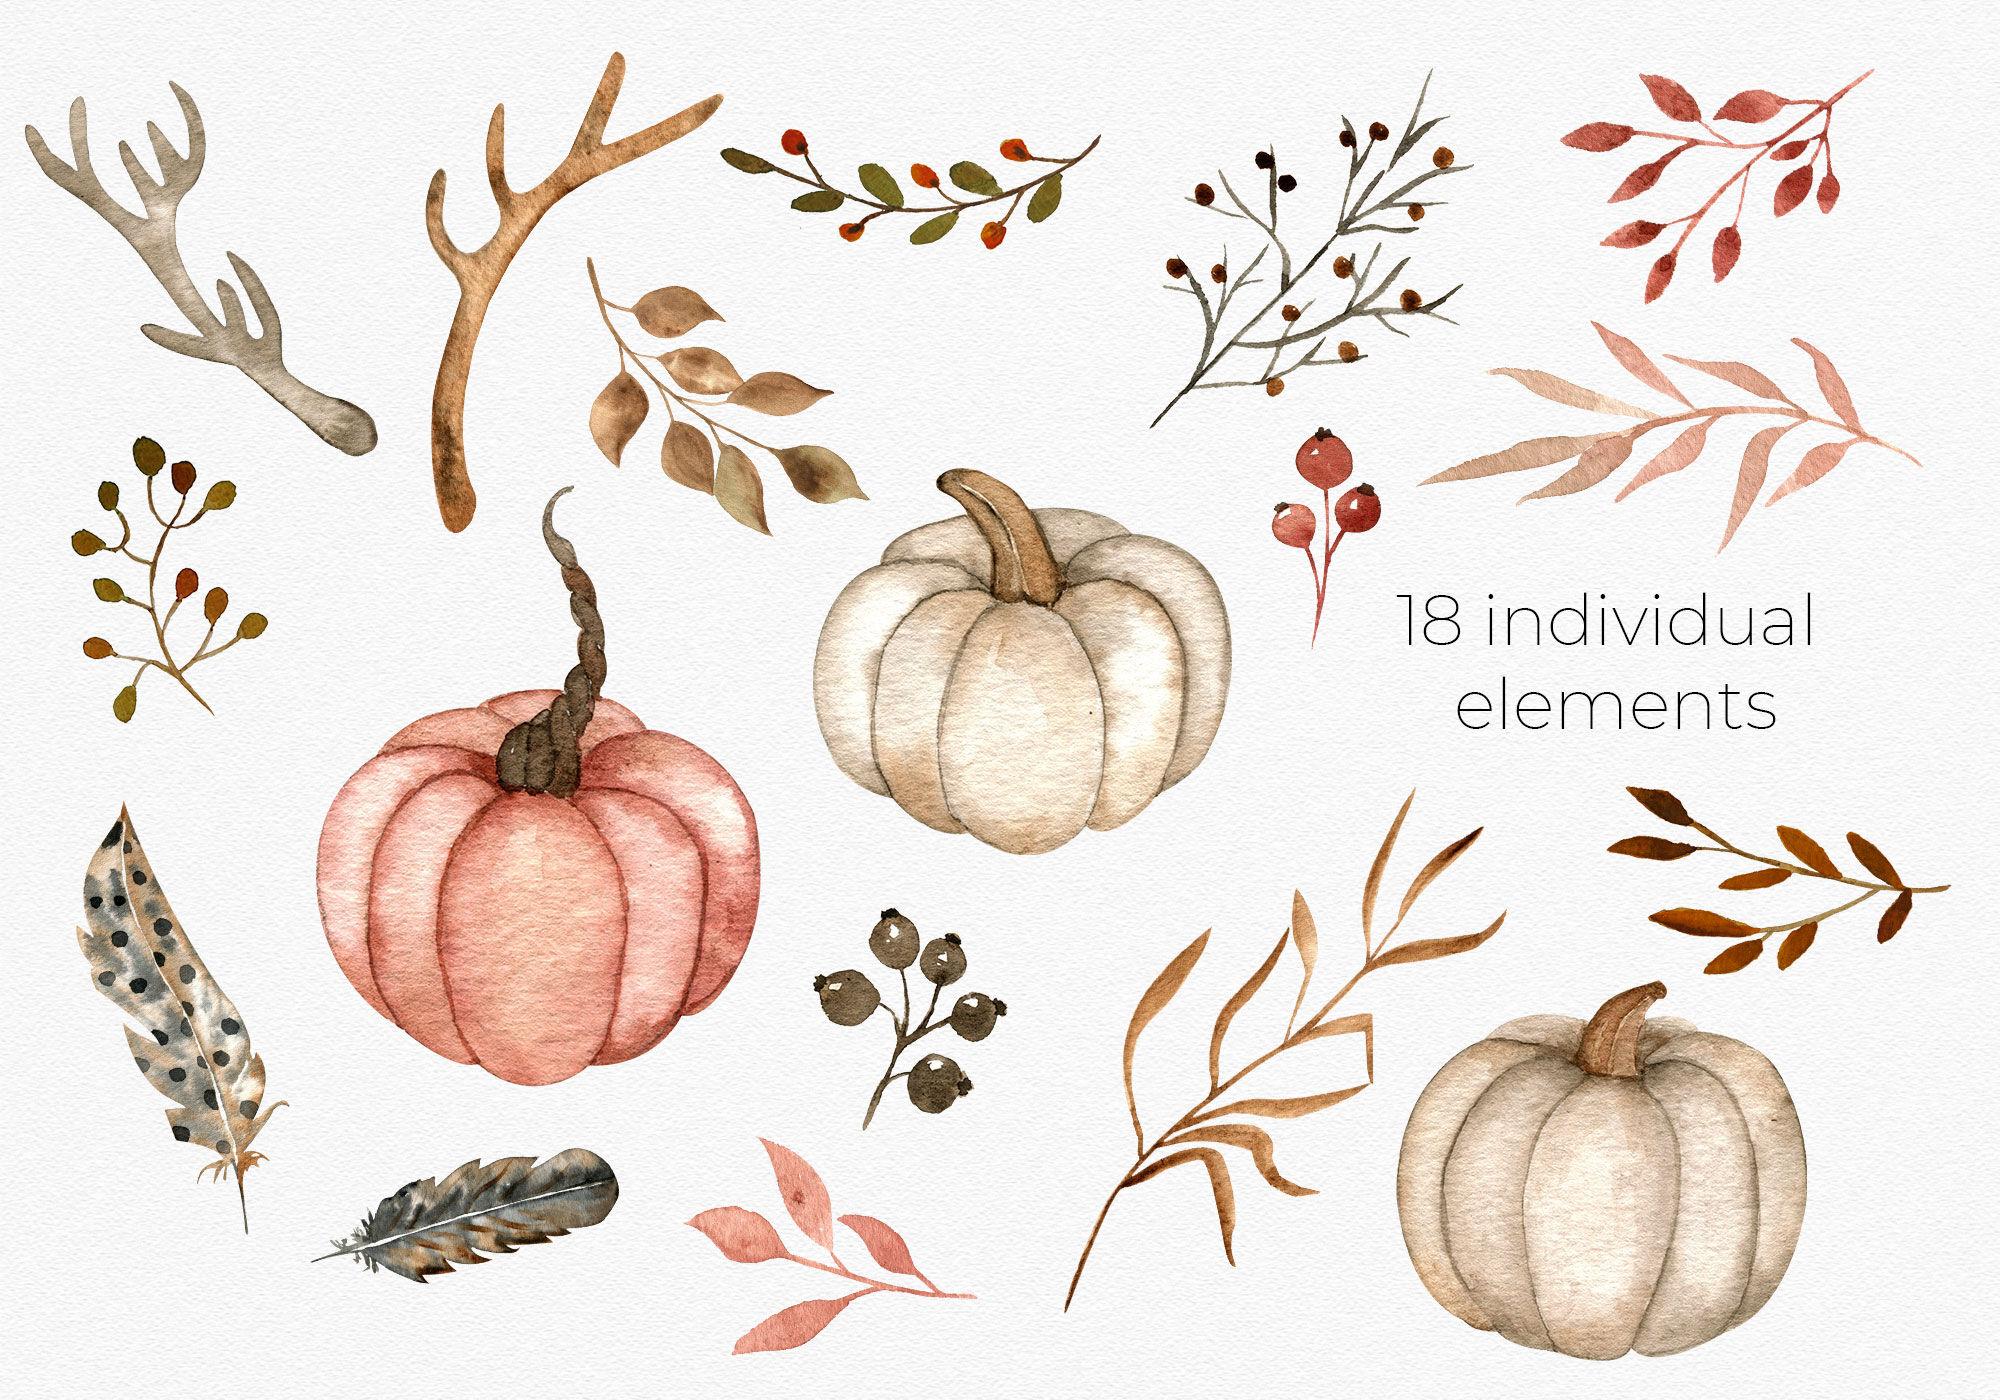 中性色调乡村秋季元素水彩剪贴画素材 Watercolor Pumpkins, Antlers, Feathers插图(2)